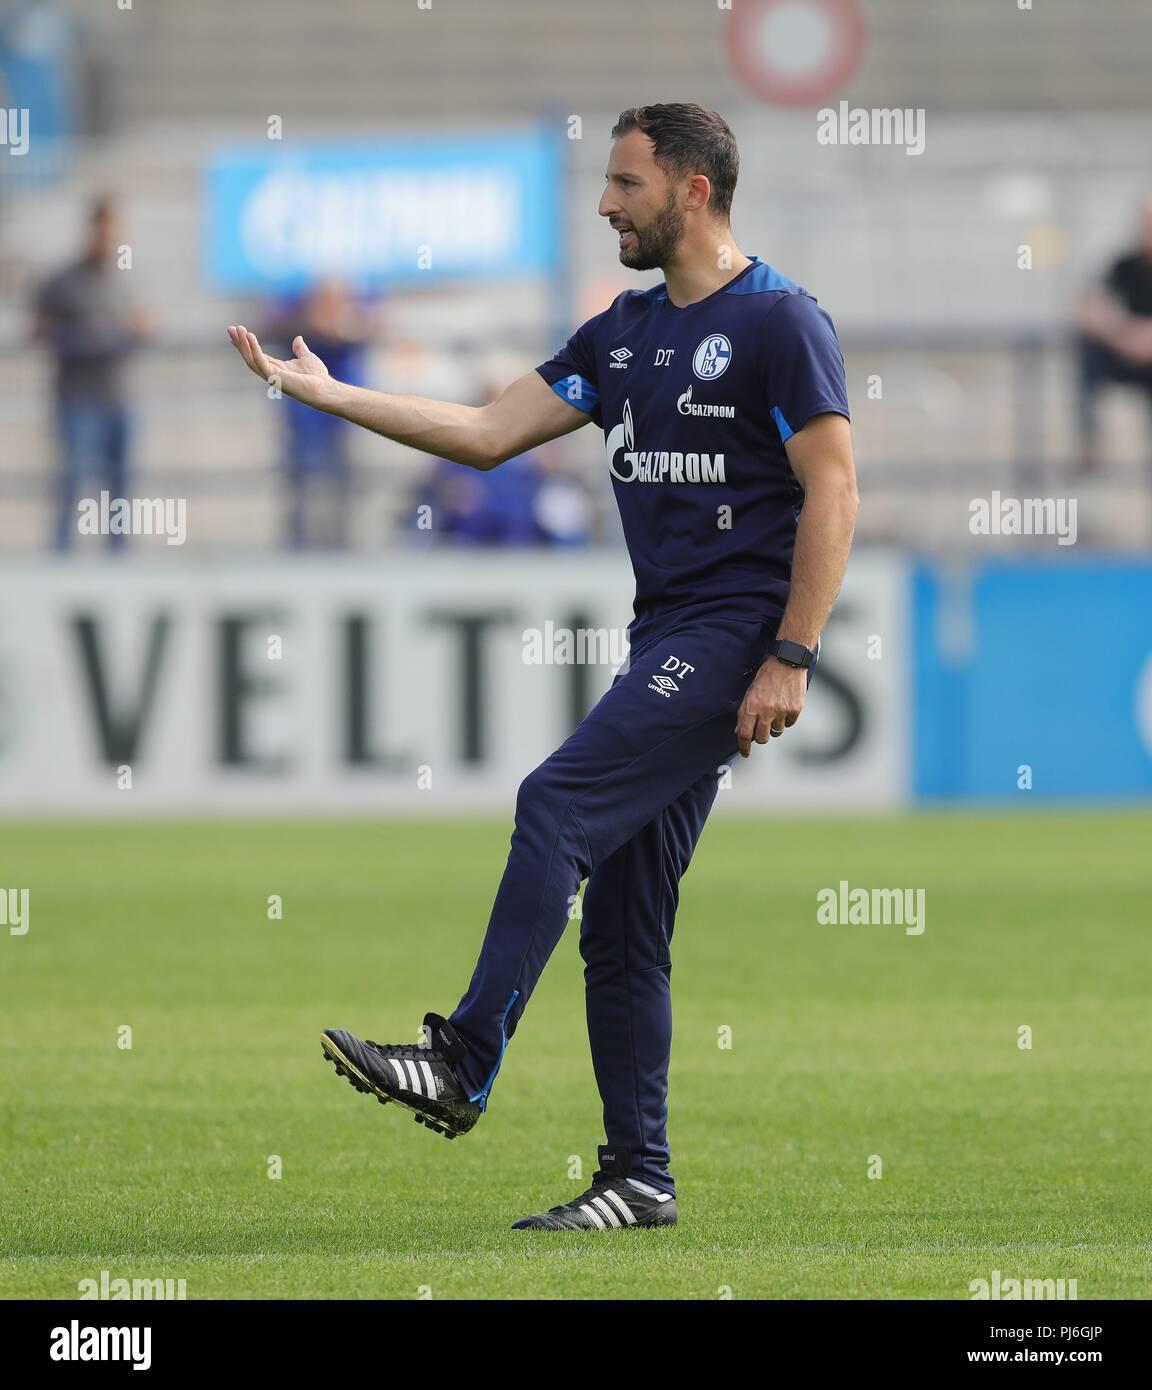 firo: 05.09.2018, football, 1.Bundesliga, season 2018/2019, FC Schalke 04, training, coach Domenico INGLESE, gesture   usage worldwide - Stock Image